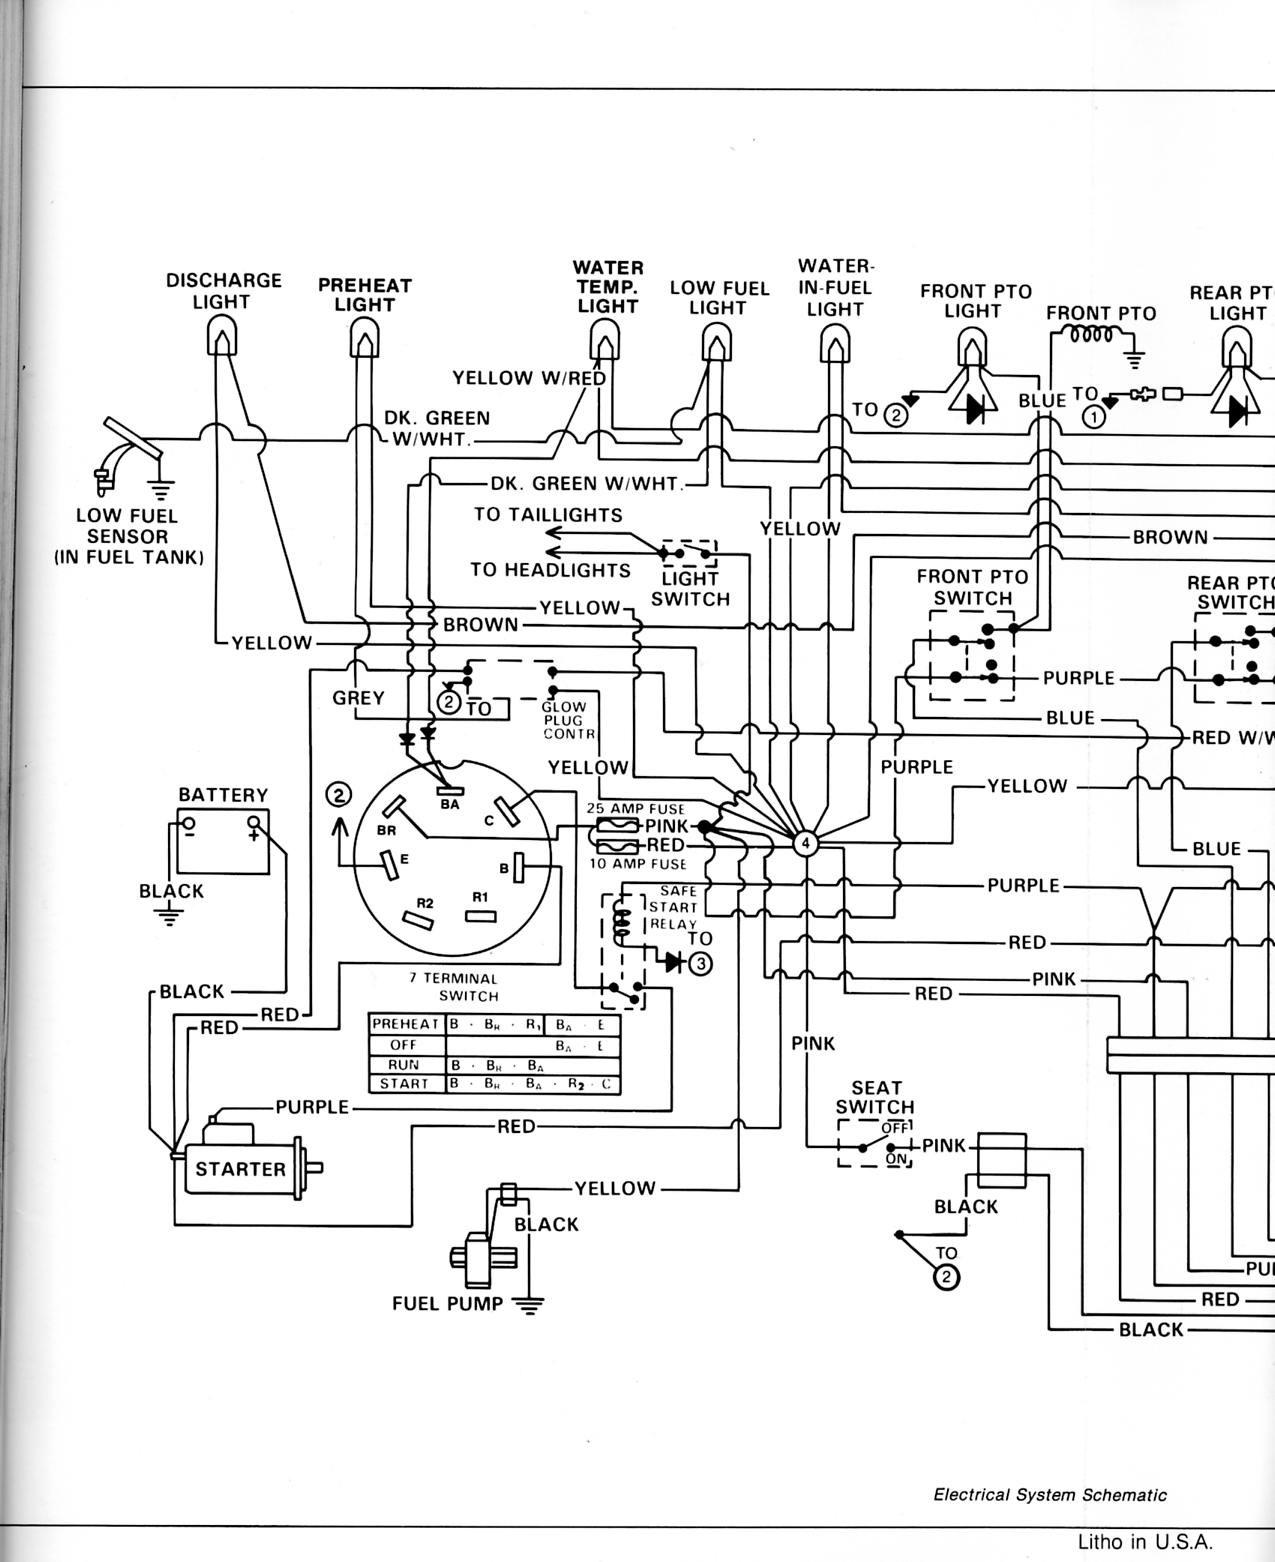 1978 John Deere Gator Electrical Diagram 77e2b9 Wiring Diagram for John Deere 750 Of 1978 John Deere Gator Electrical Diagram